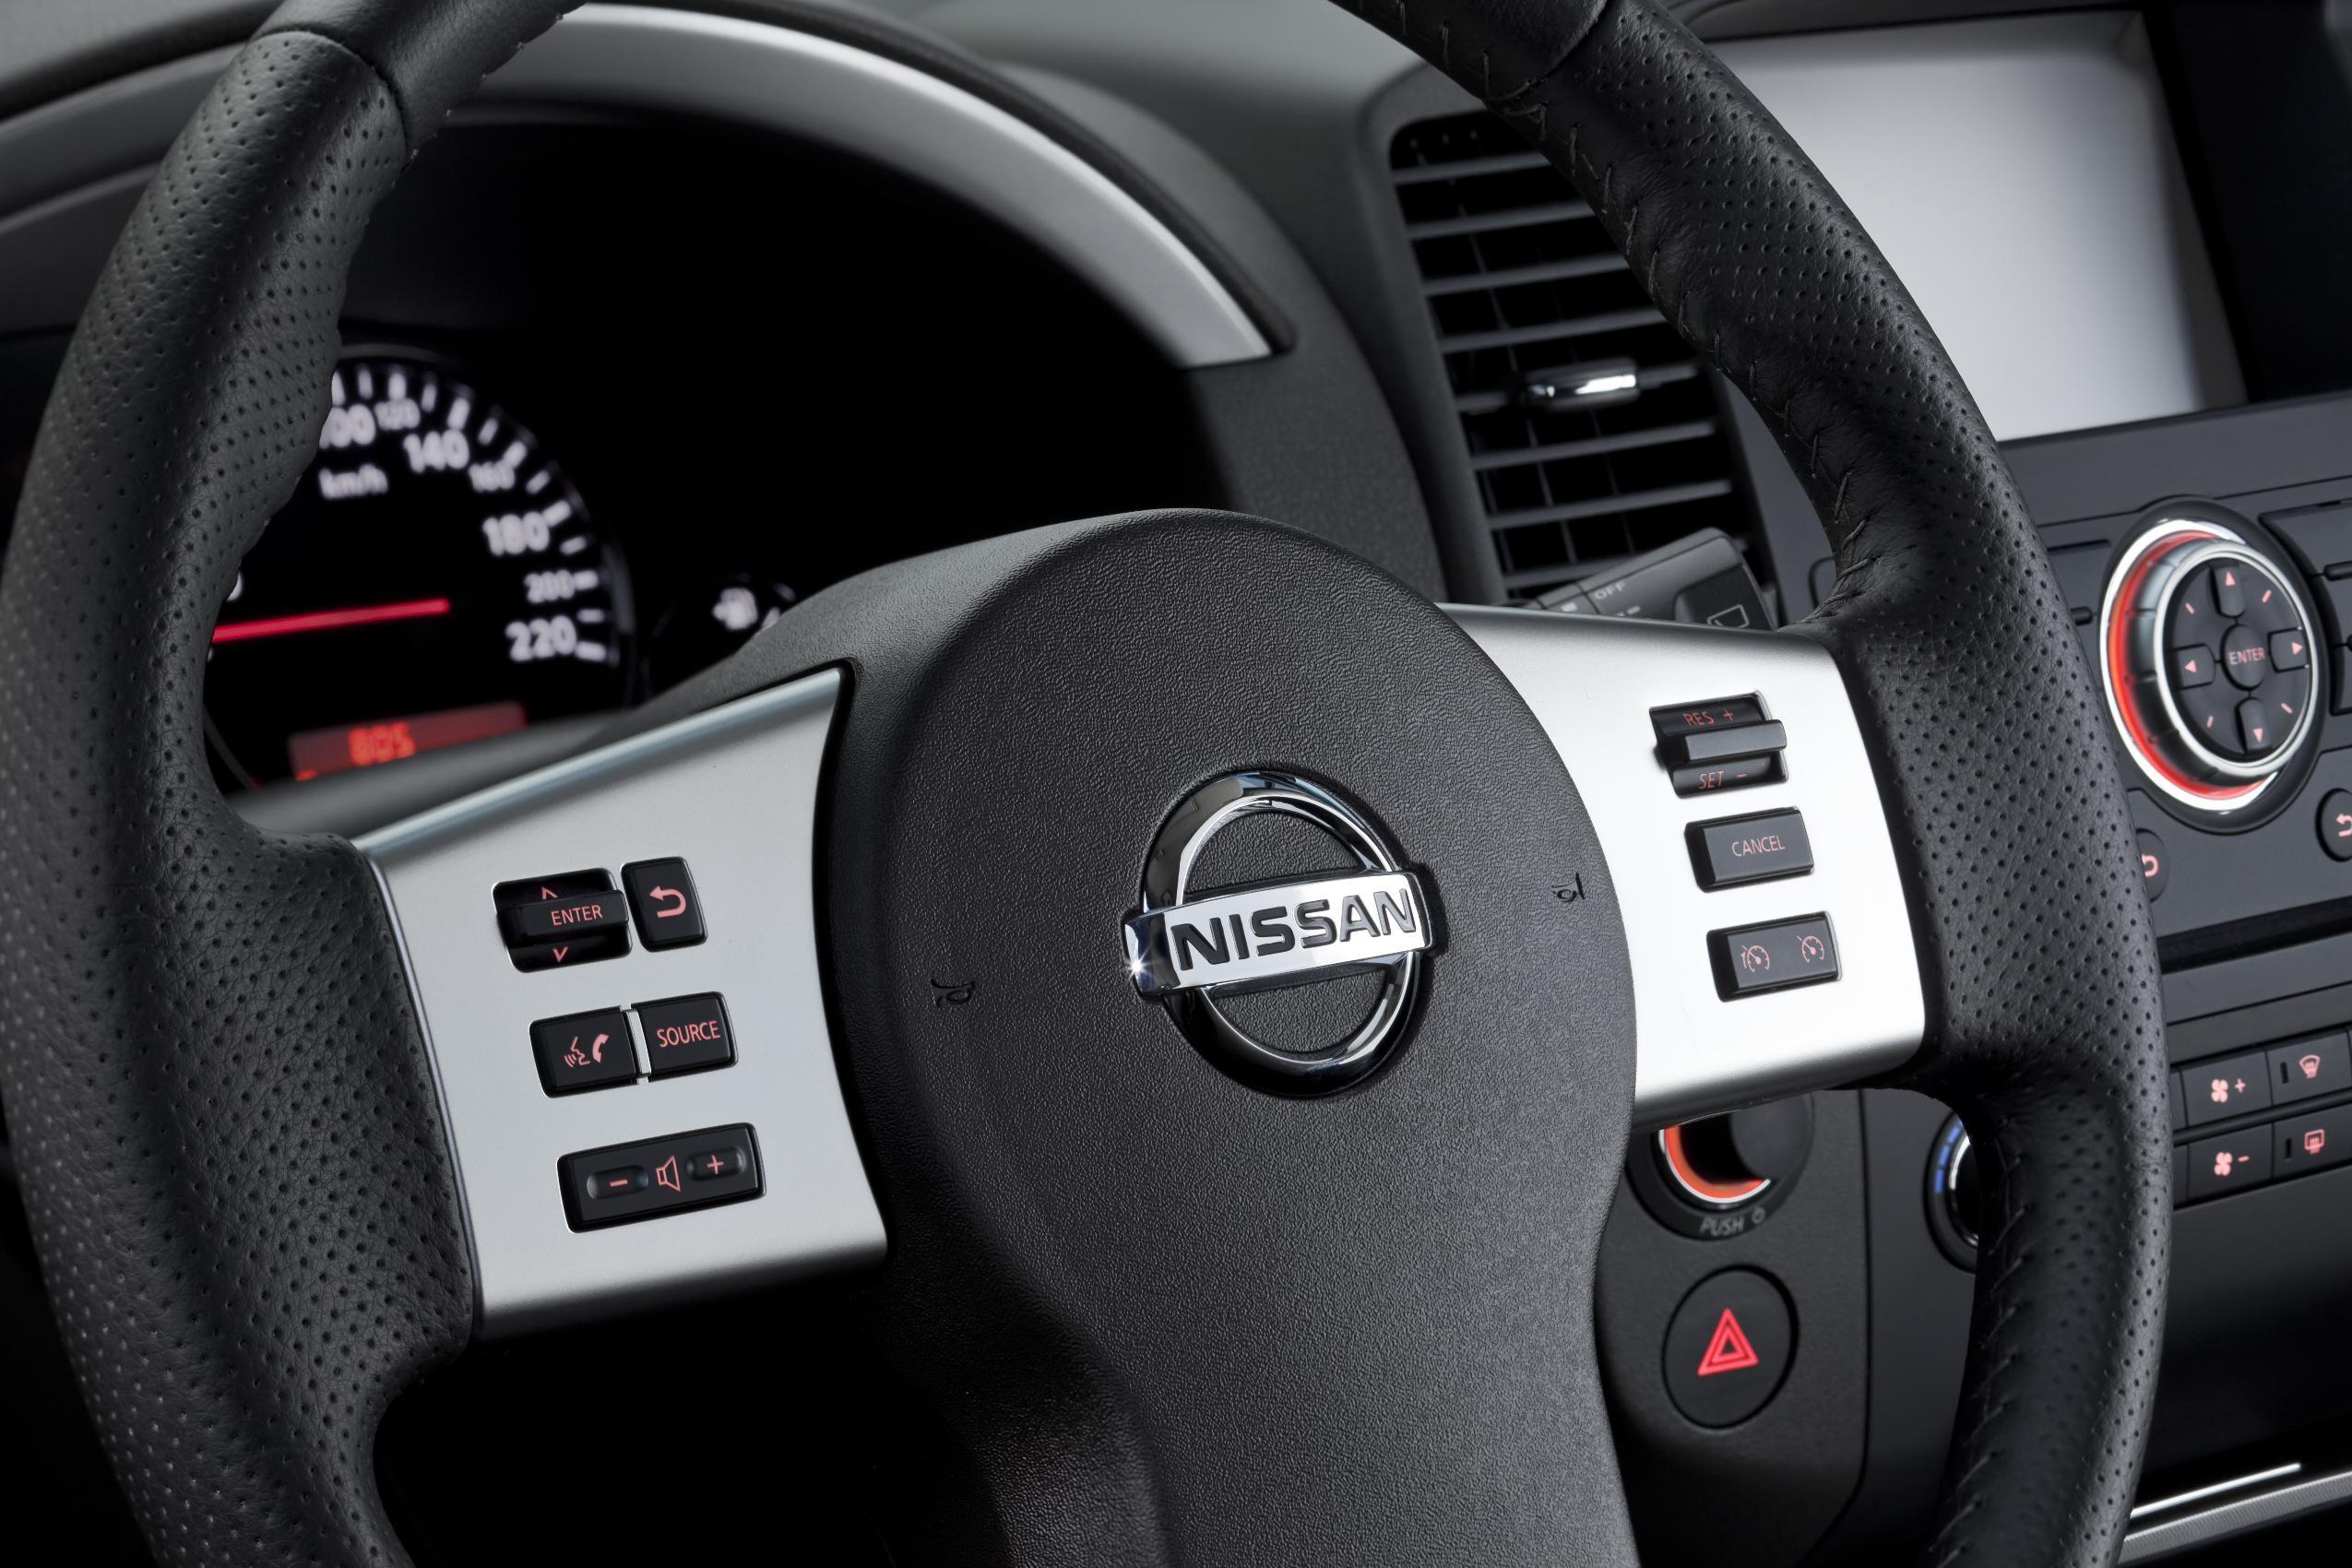 2010 Nissan Navara, Pathfinder revealed, no V6 diesel for ...